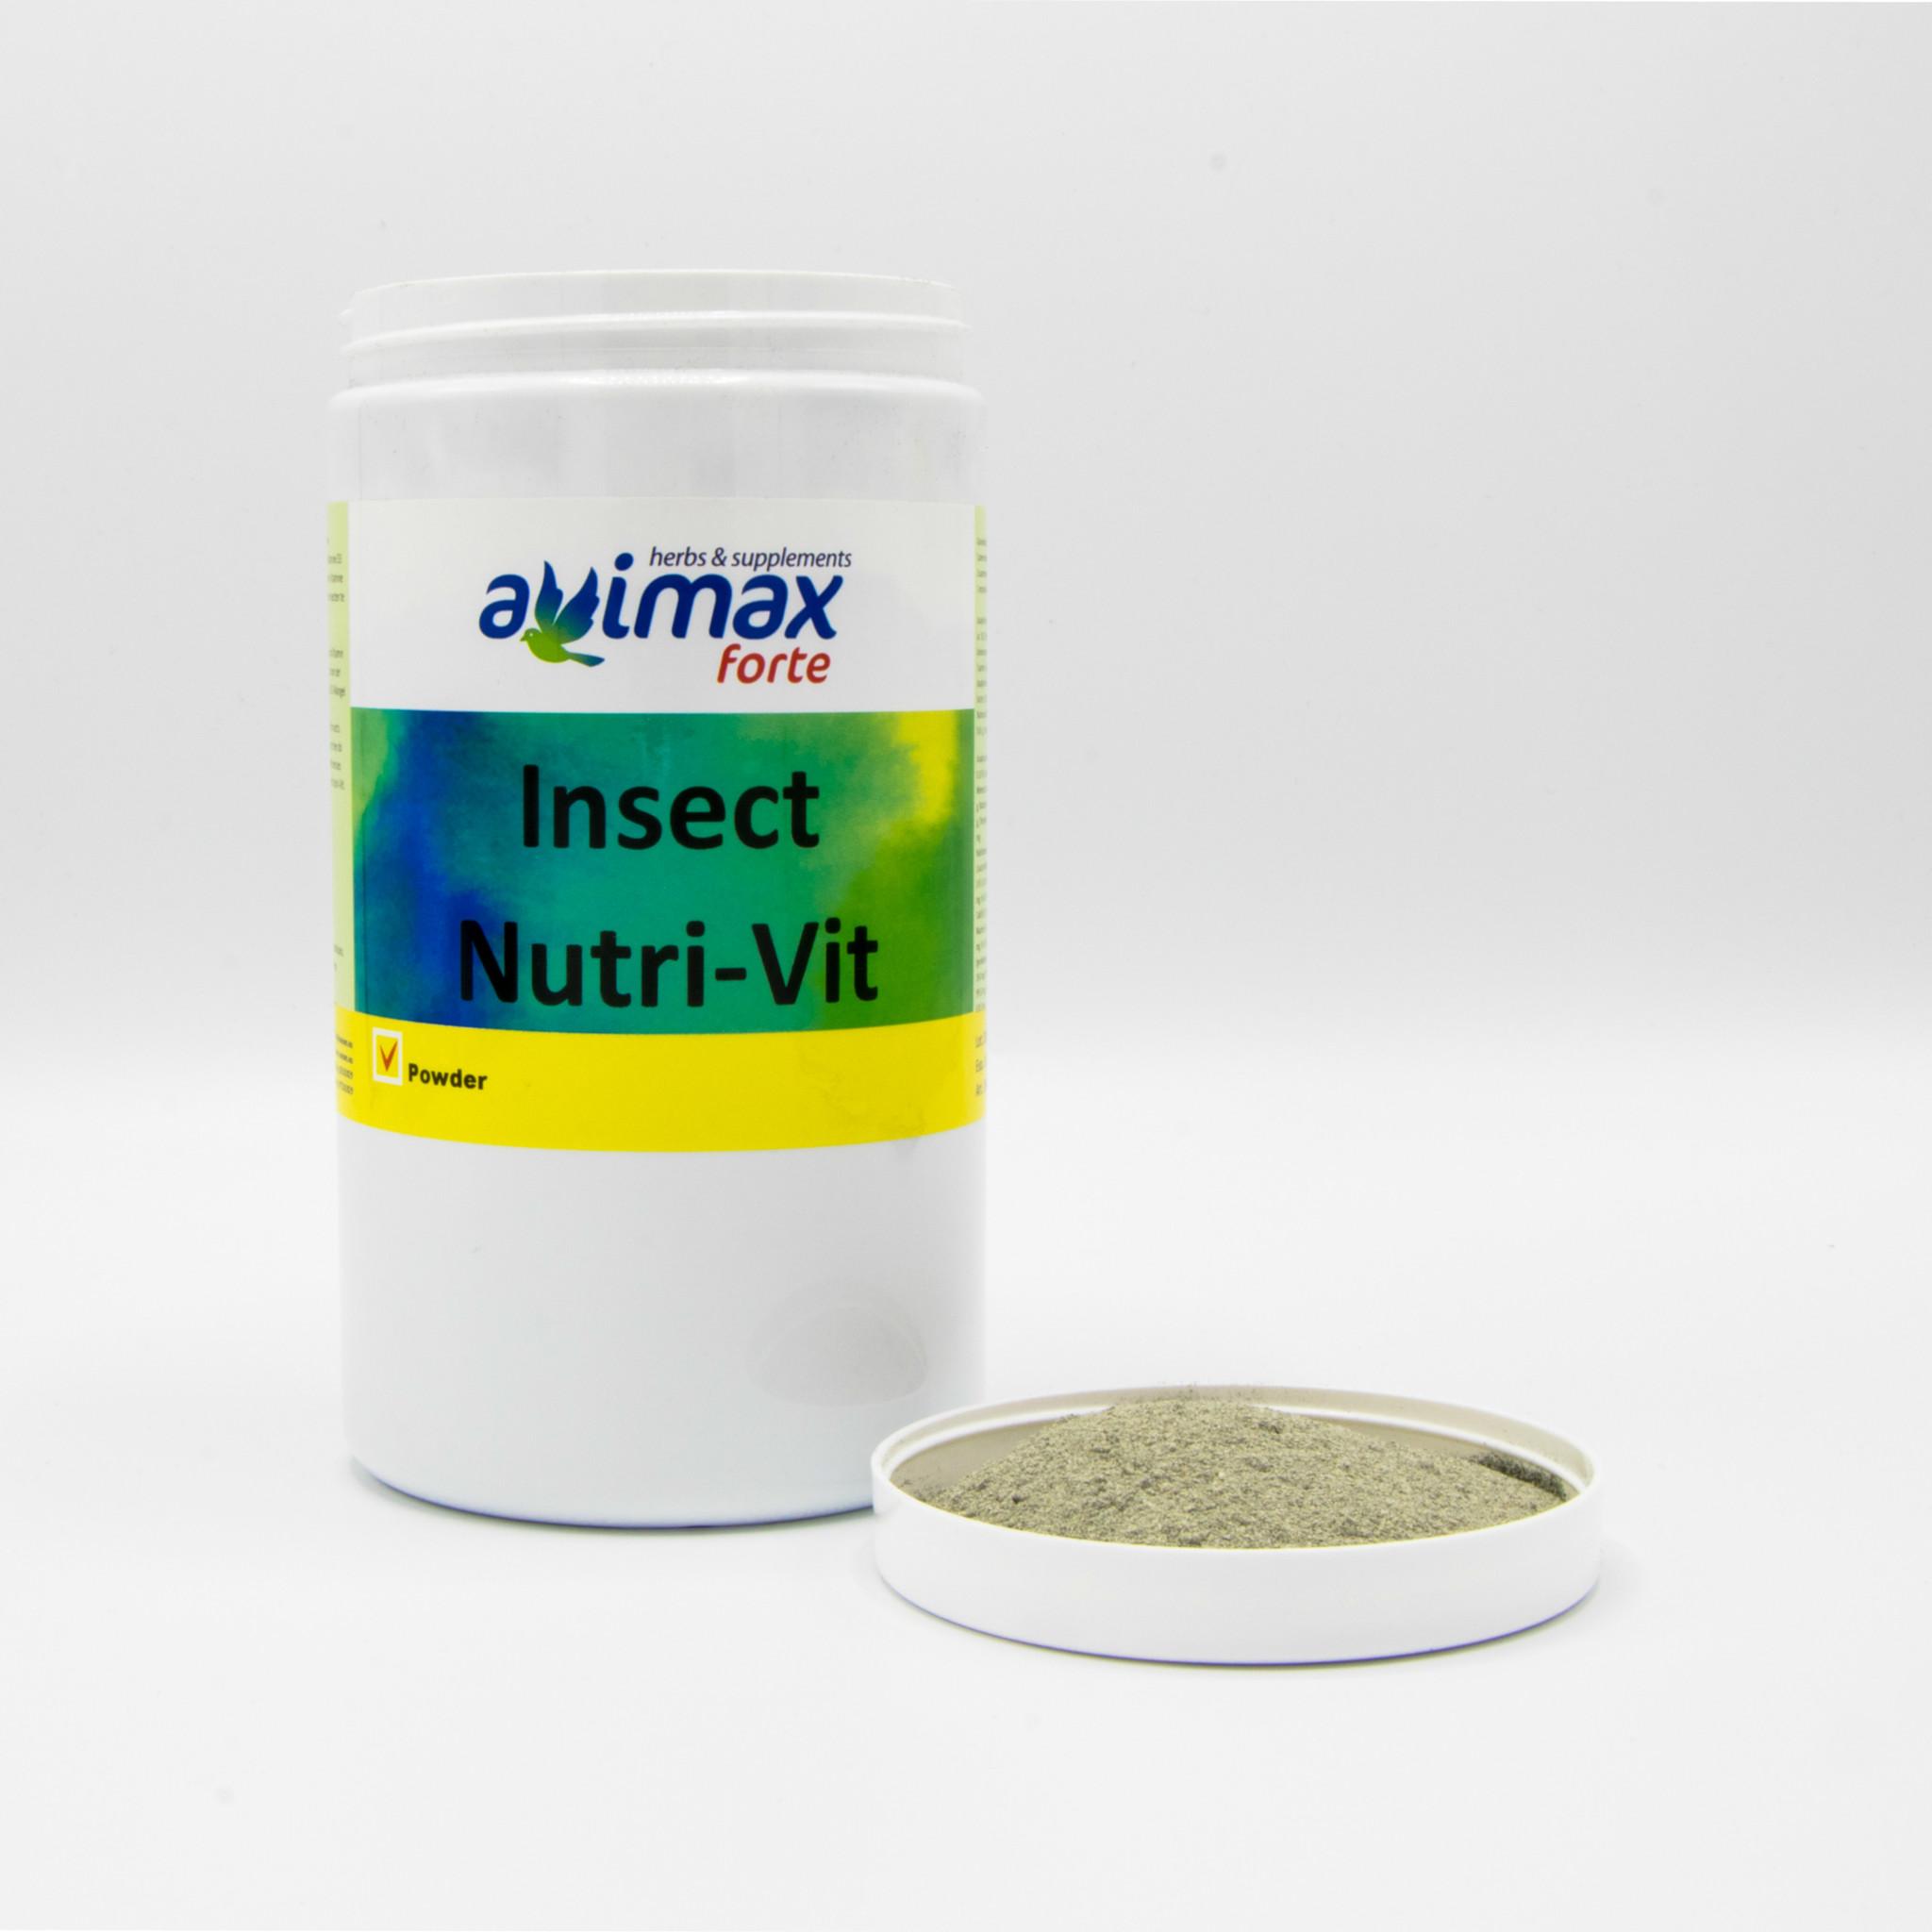 AviMax Forte AviMax Forte Insect Nutri-Vit 750 gr